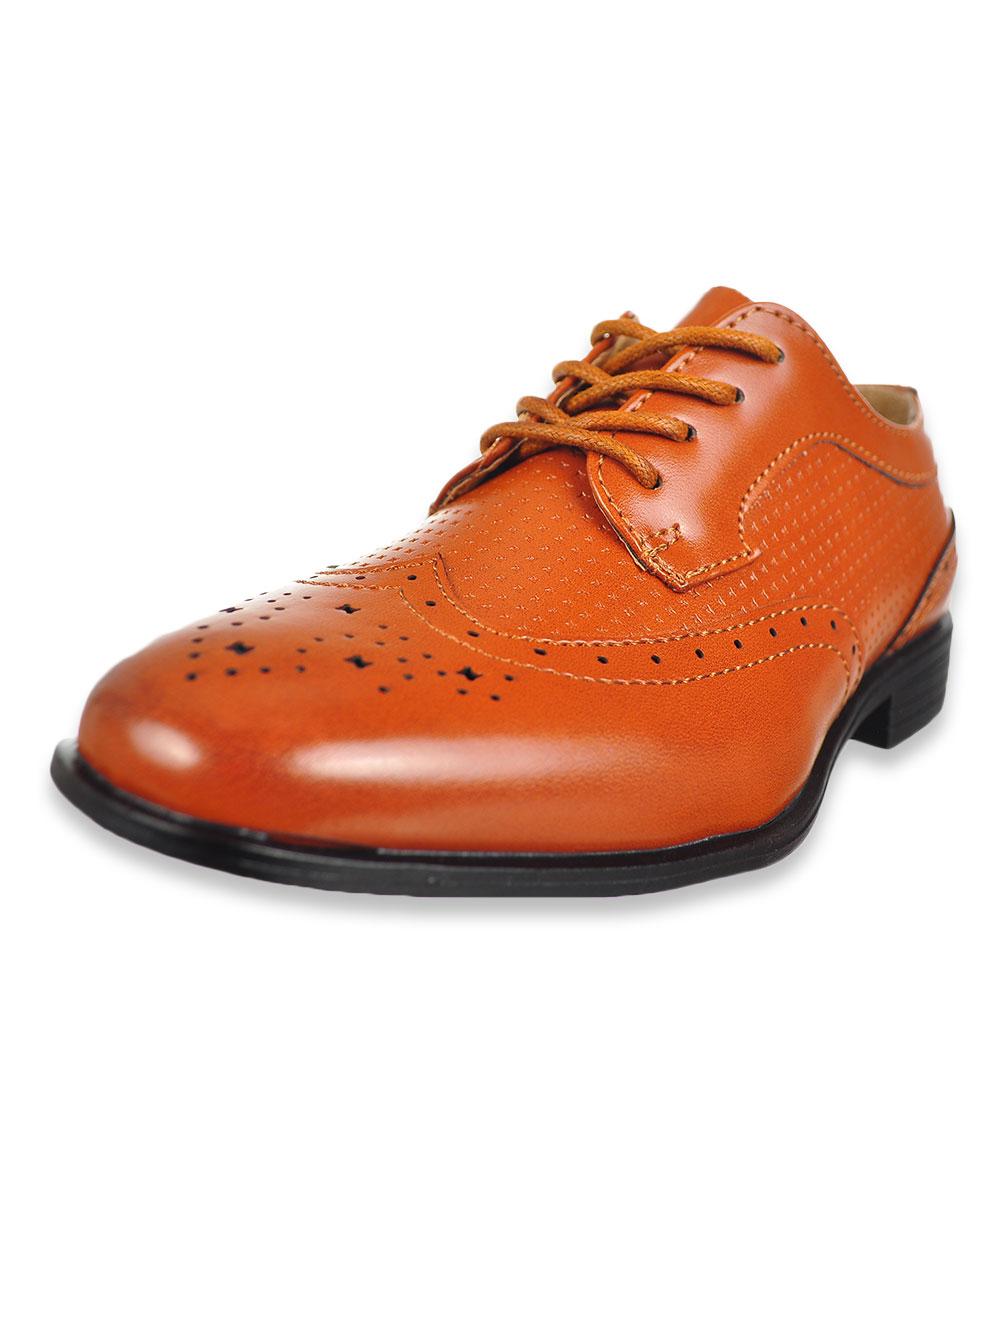 Jodano Collection Boys Dress Shoes